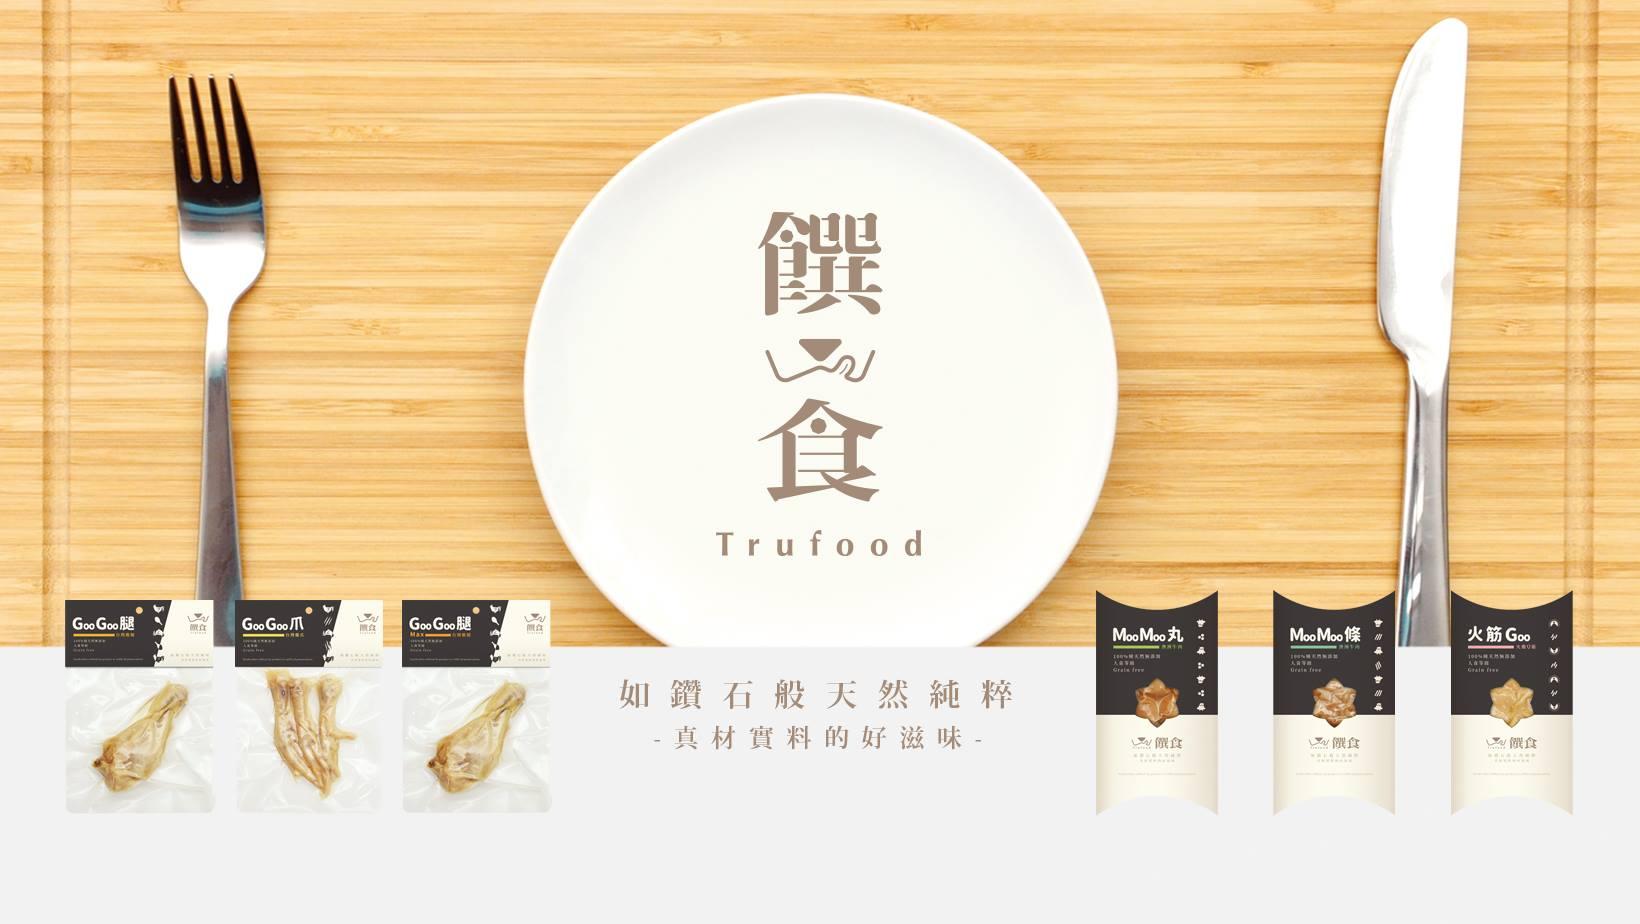 trufood-introduction.jpg